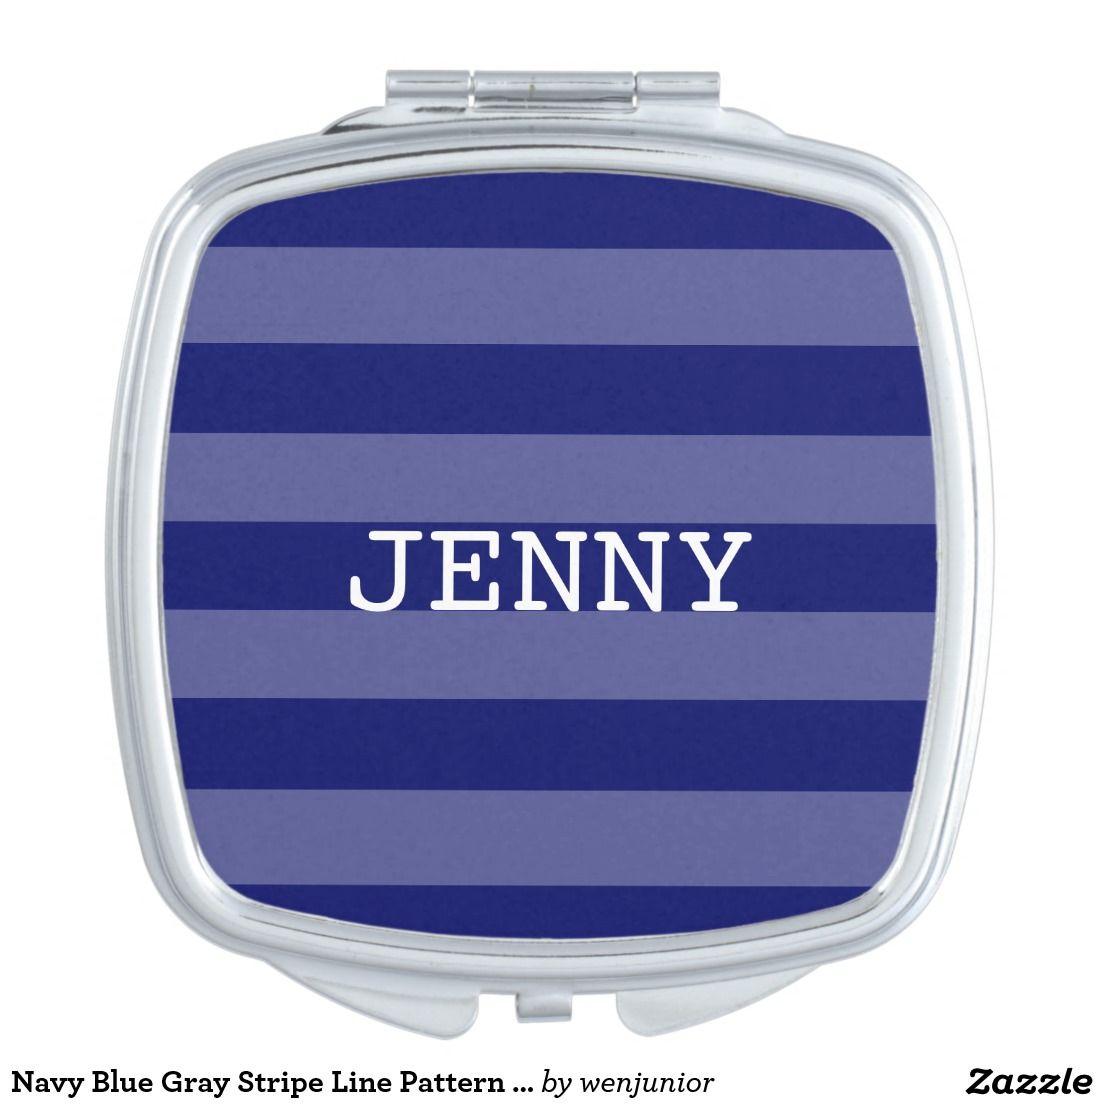 Navy Blue Gray Stripe Line Pattern Compact Mirror